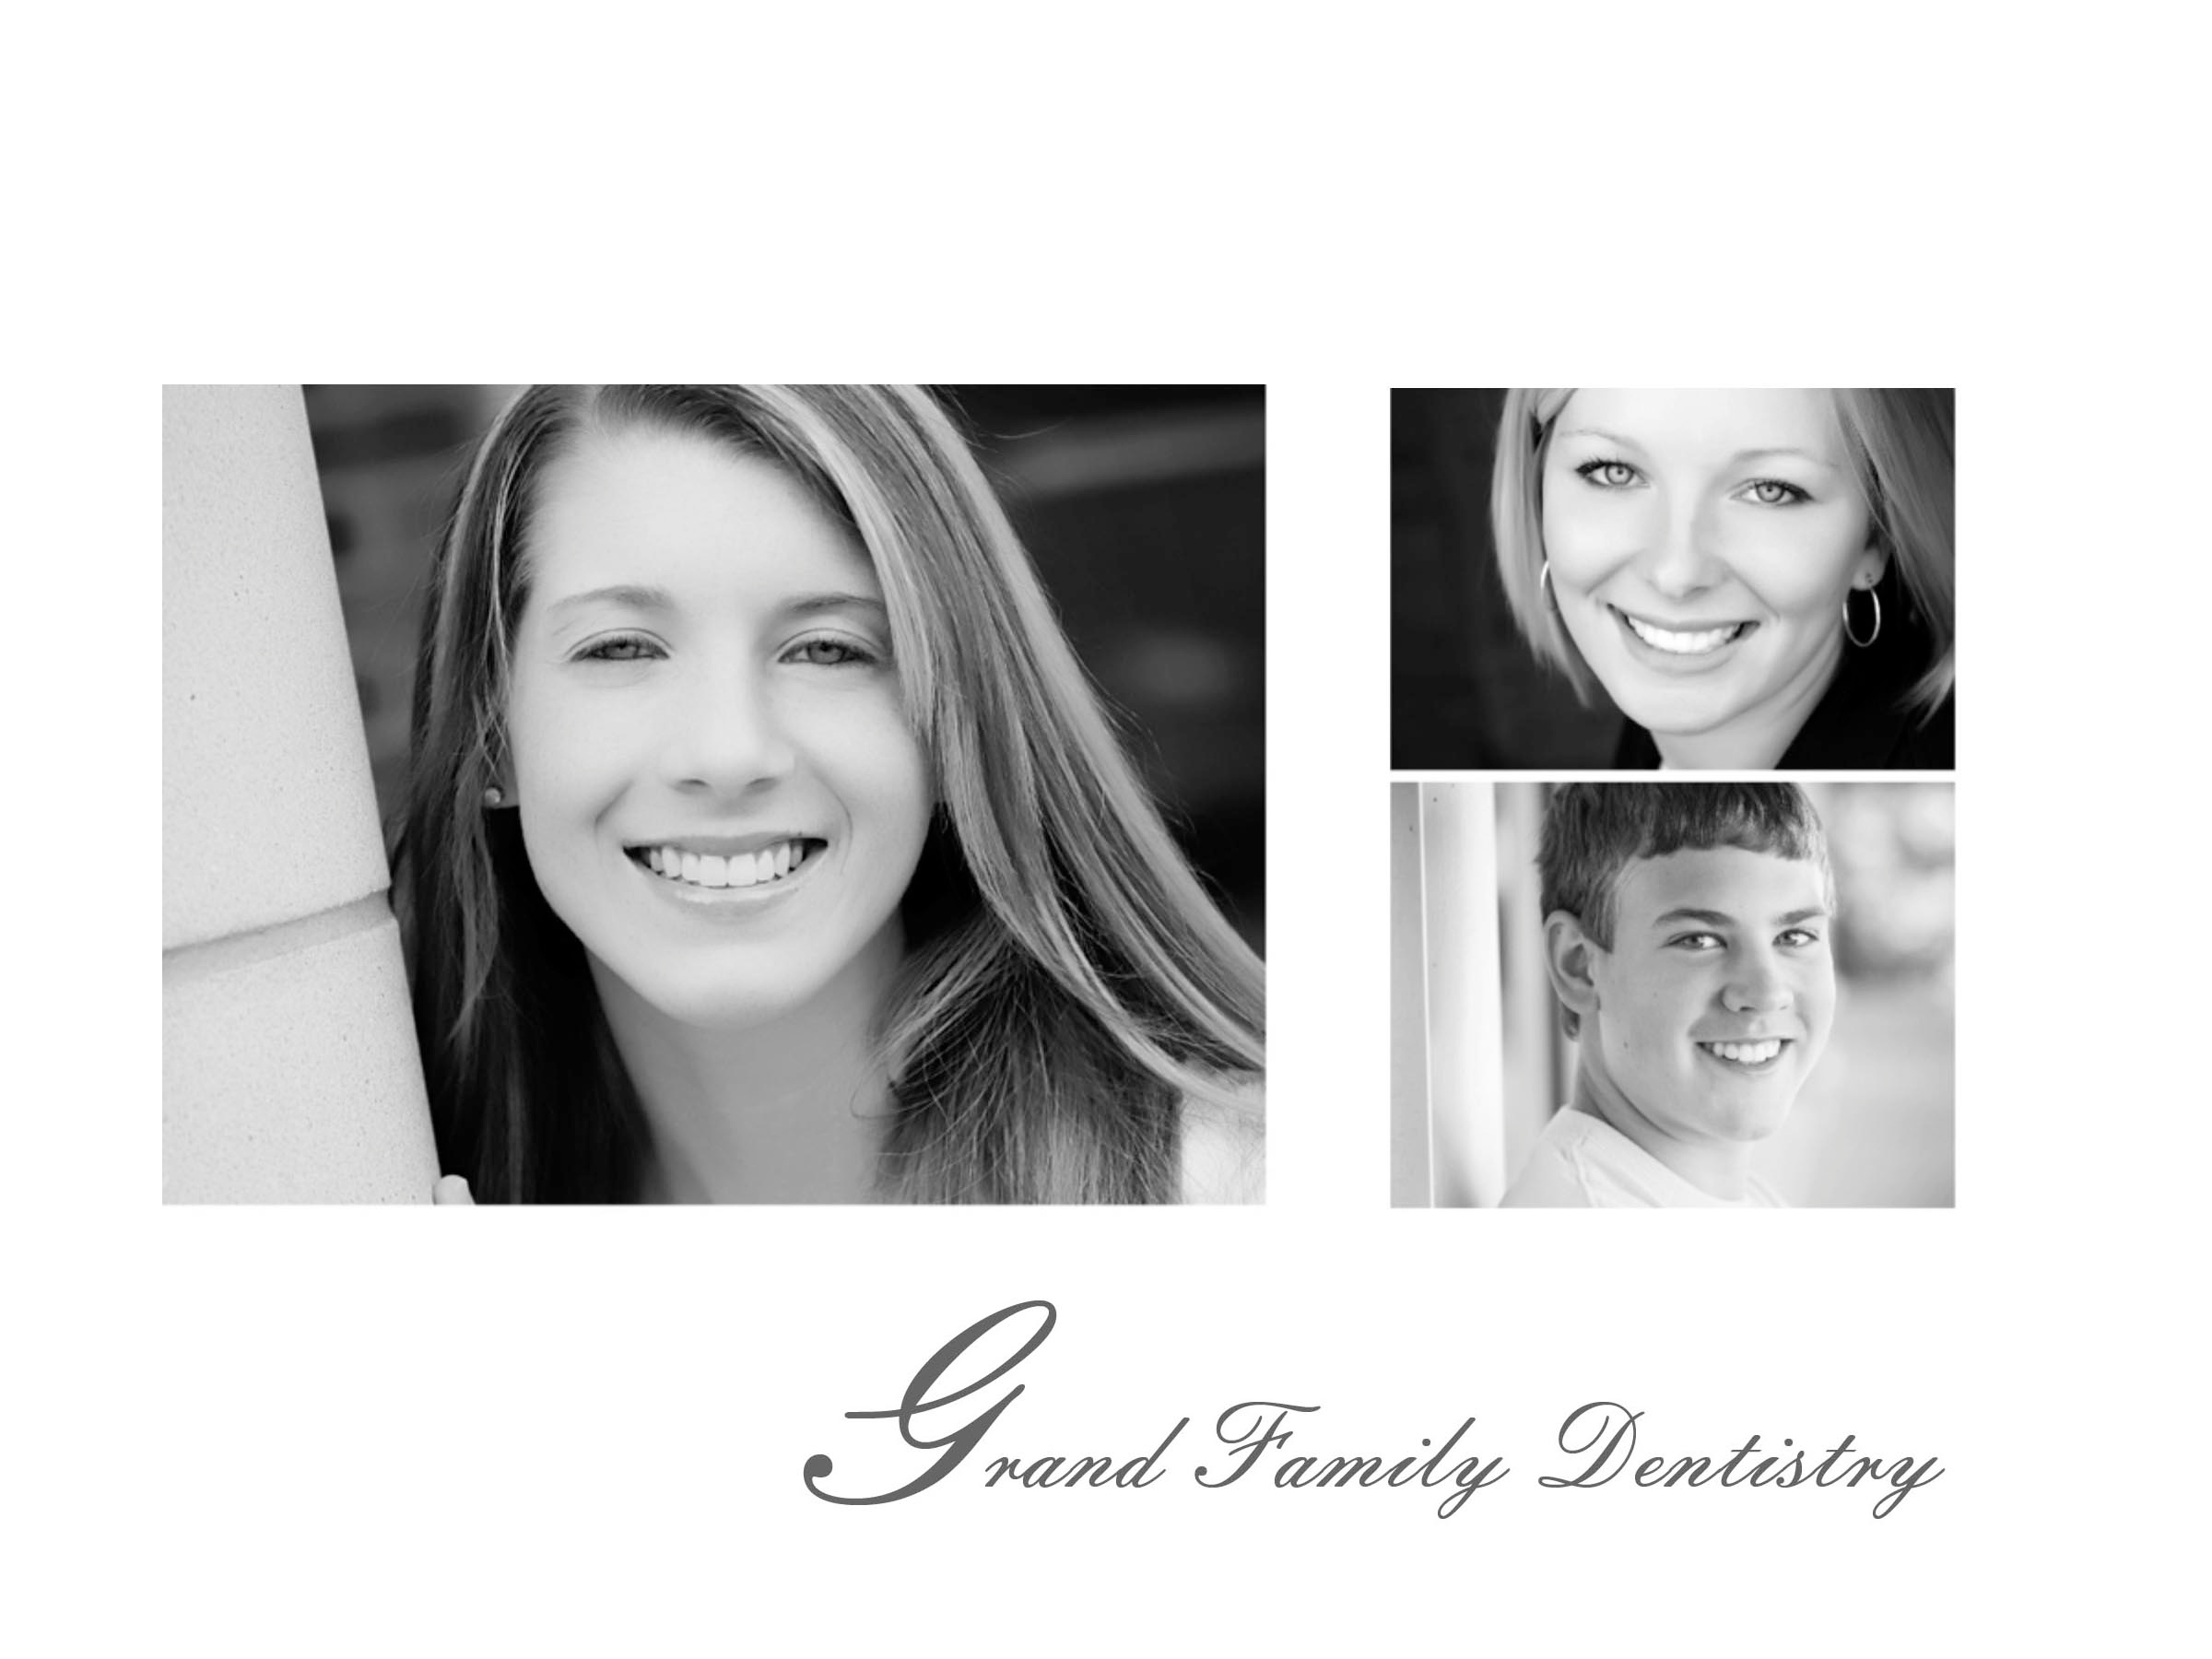 Grand Family Dentistry image 7